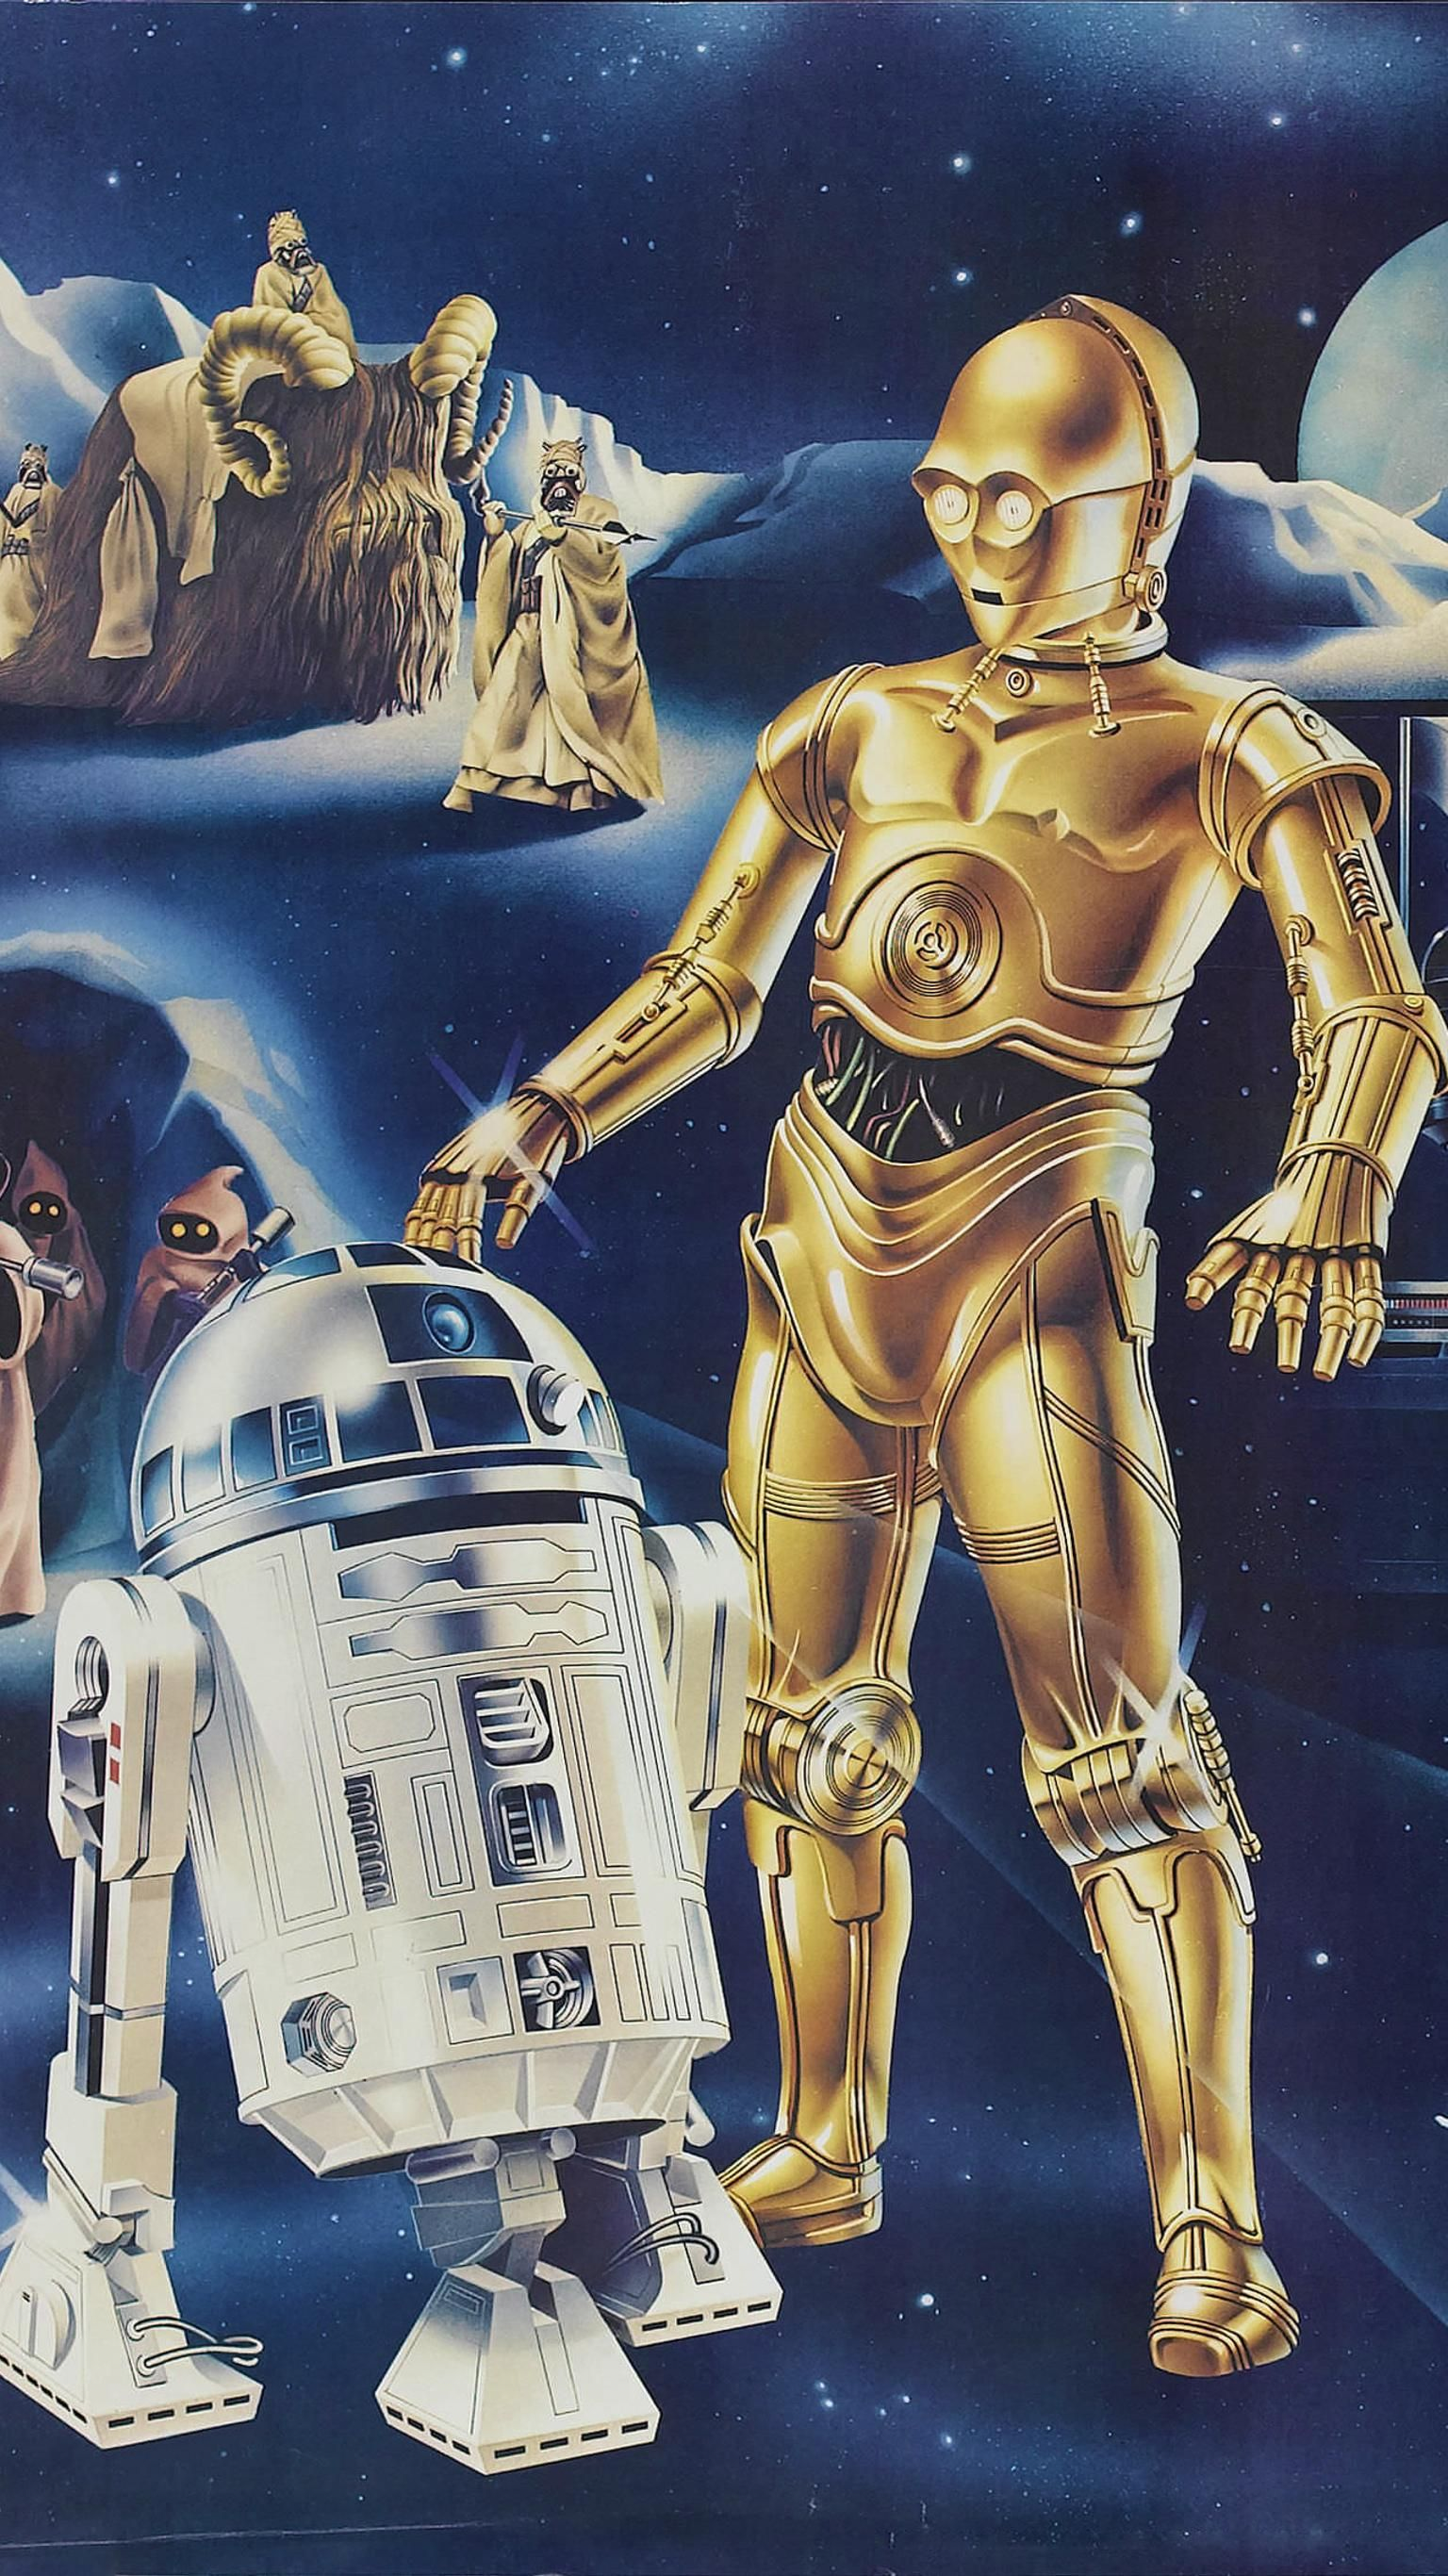 Star Wars 1977 Phone Wallpaper Moviemania Star Wars Poster Star Wars Geek Star Wars 1977